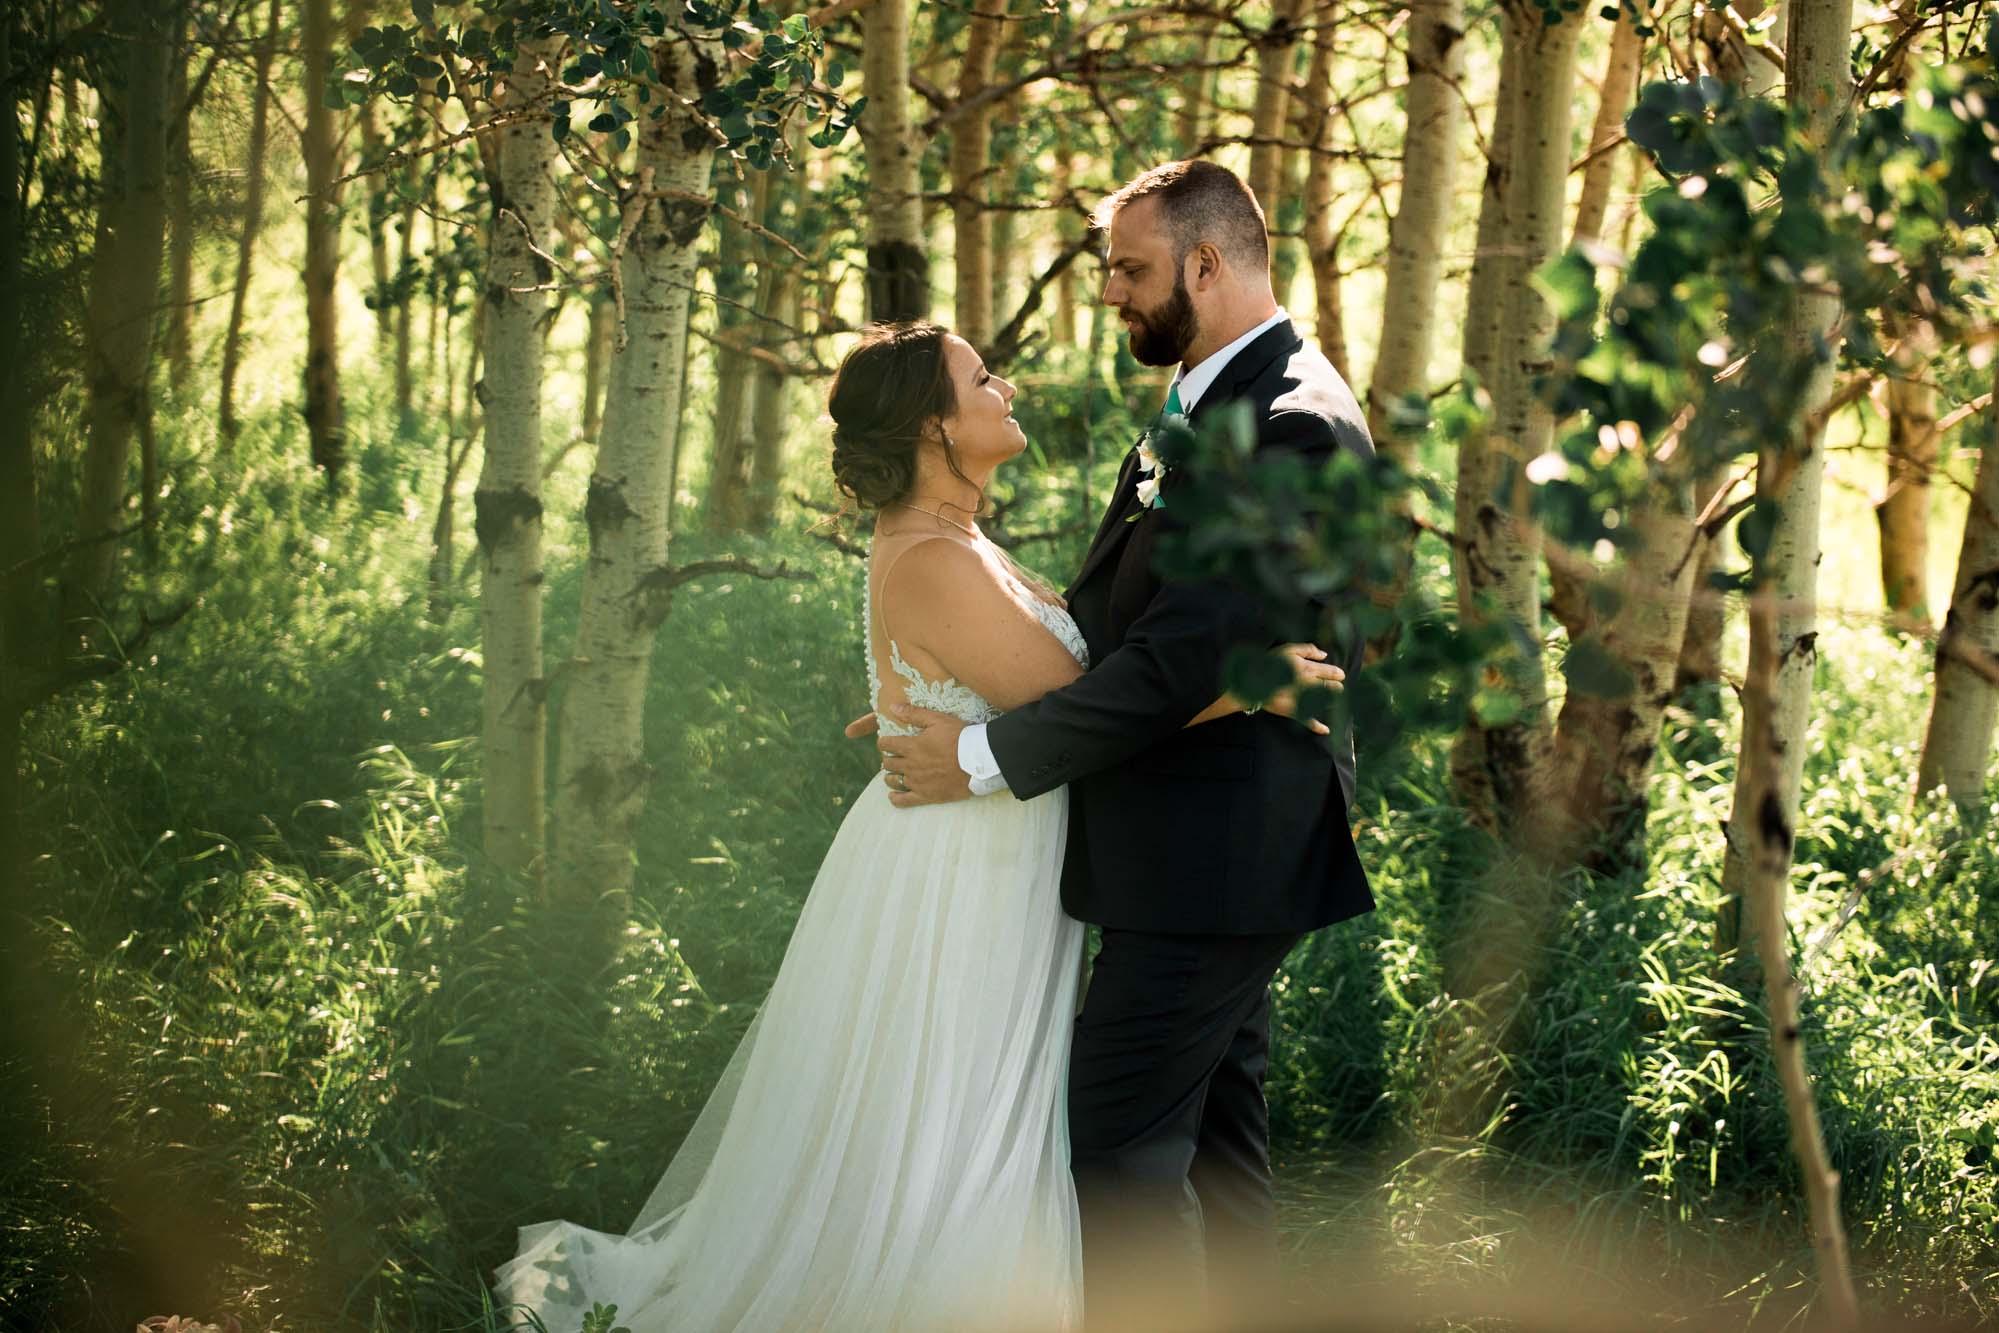 Calgary wedding photographer - Nose Hill Park wedding photography